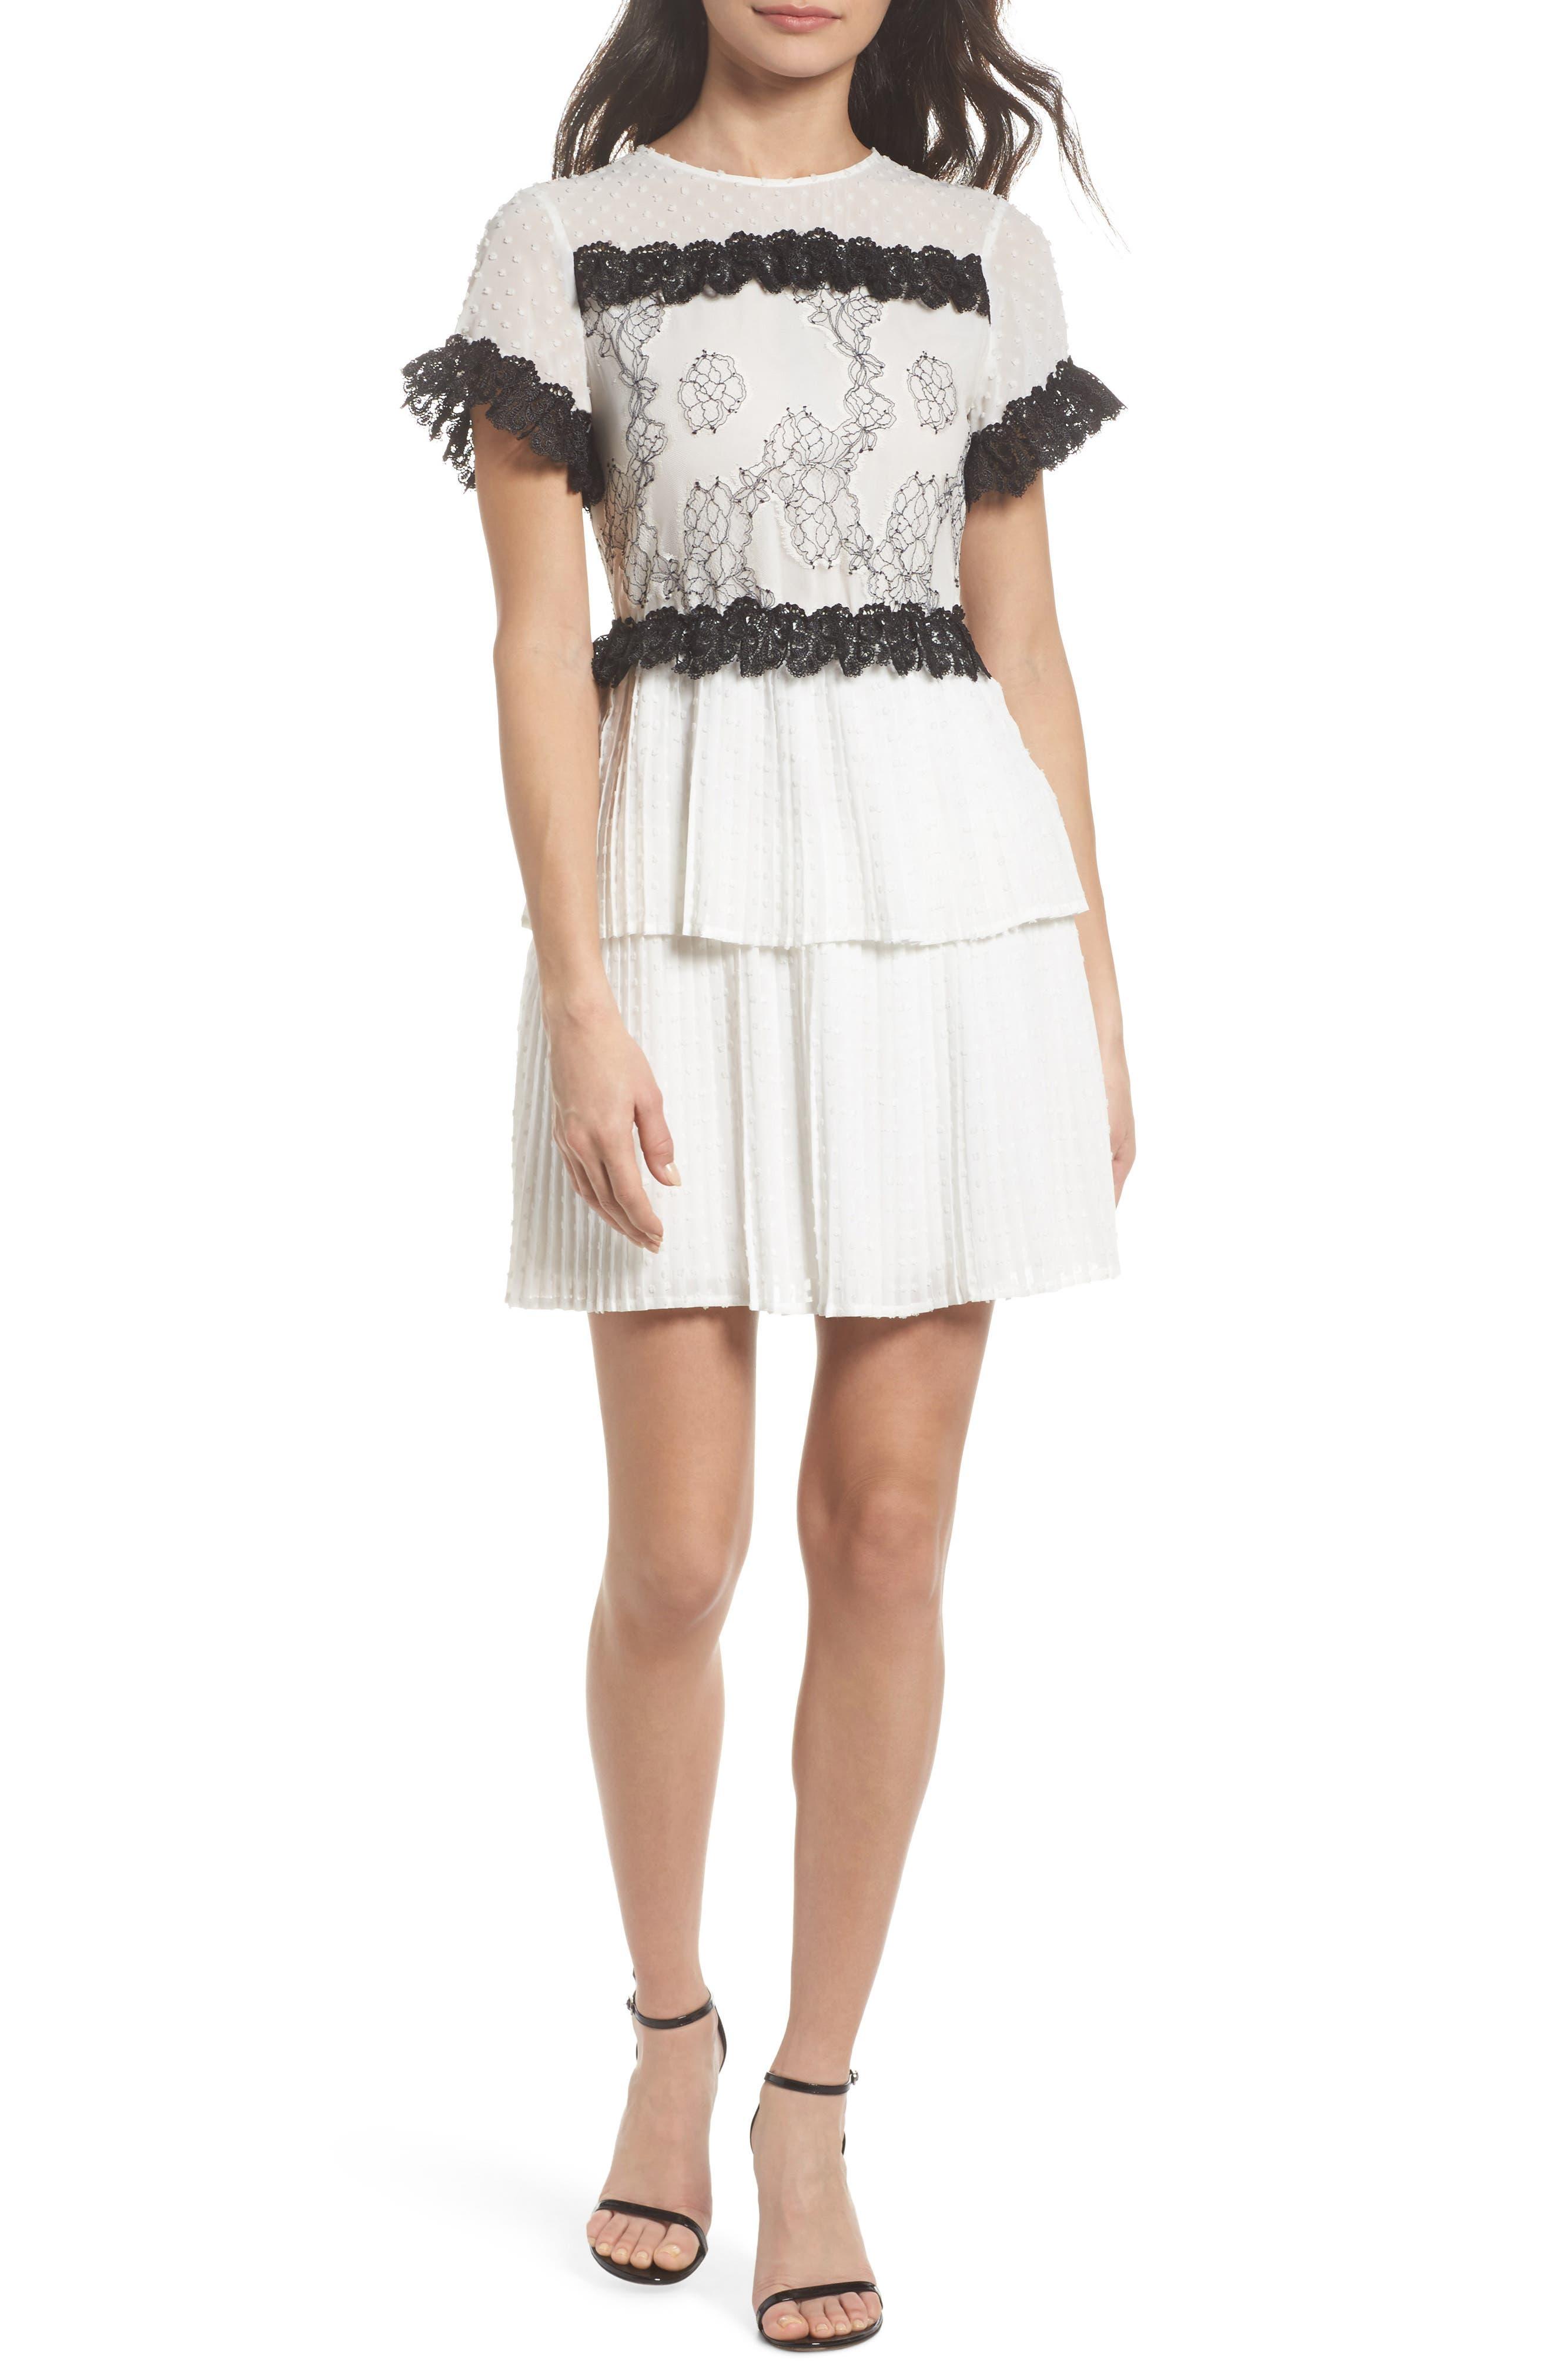 Melita Tiered Lace Dress,                             Main thumbnail 1, color,                             White W/ Black Lace